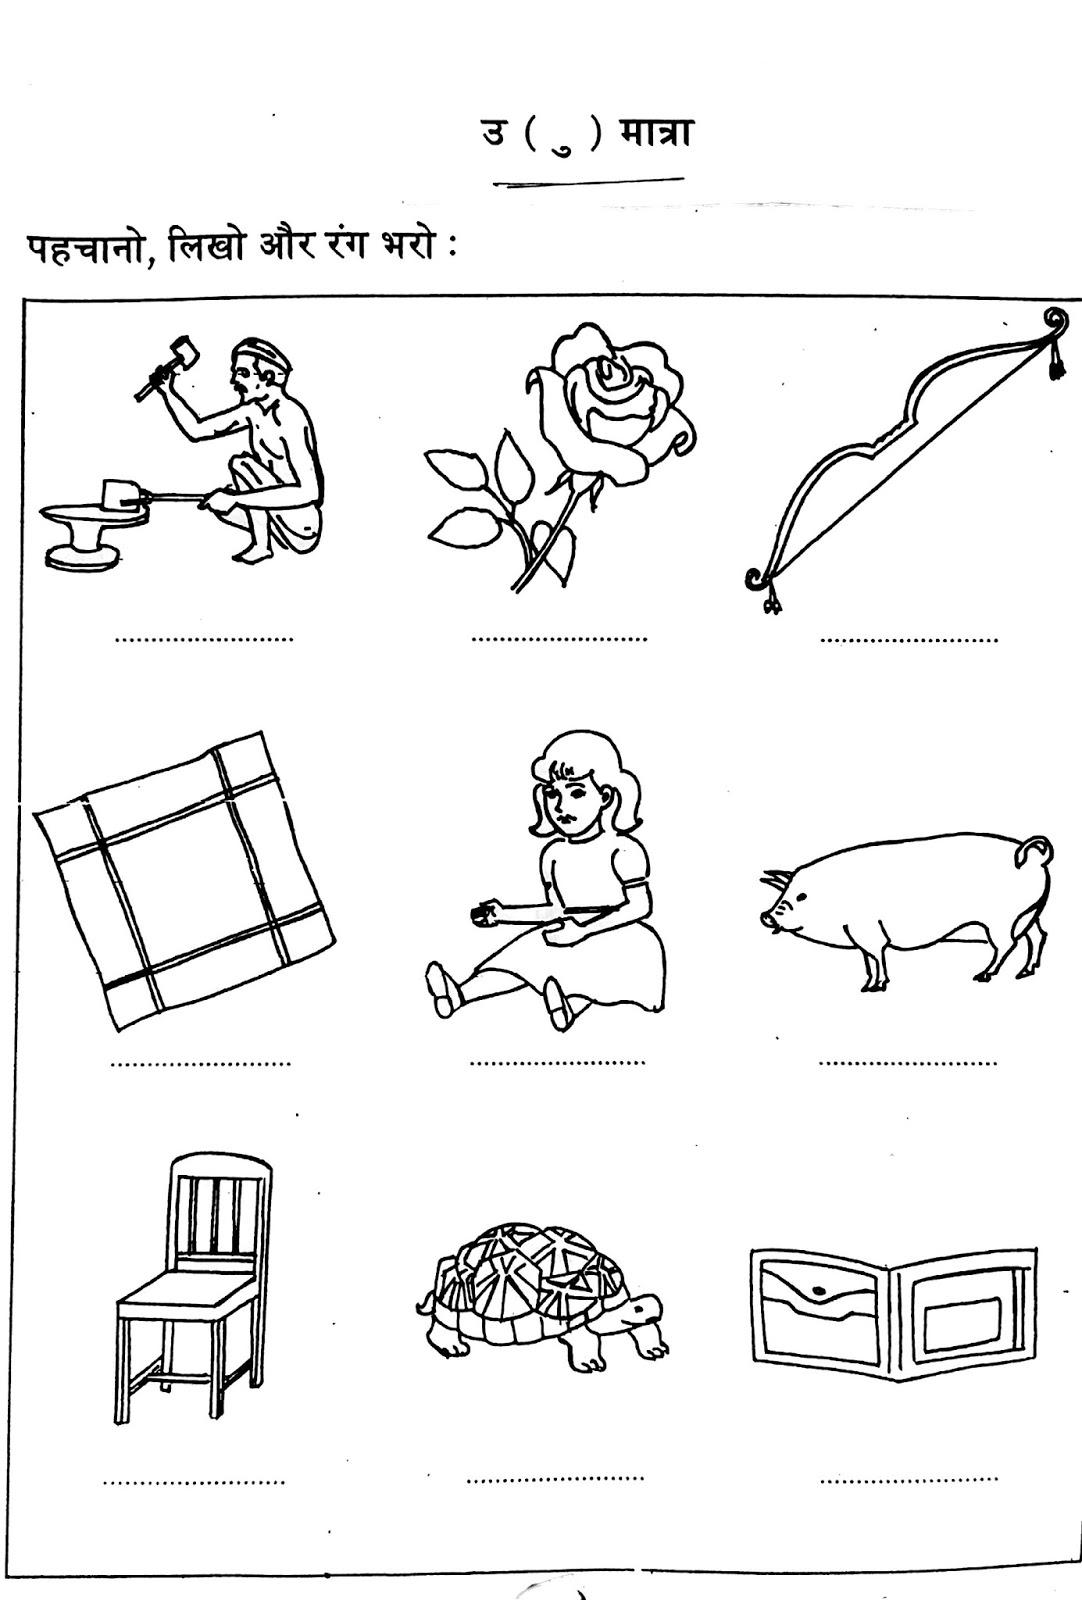 Hindi Worksheet For Class 1 Matra